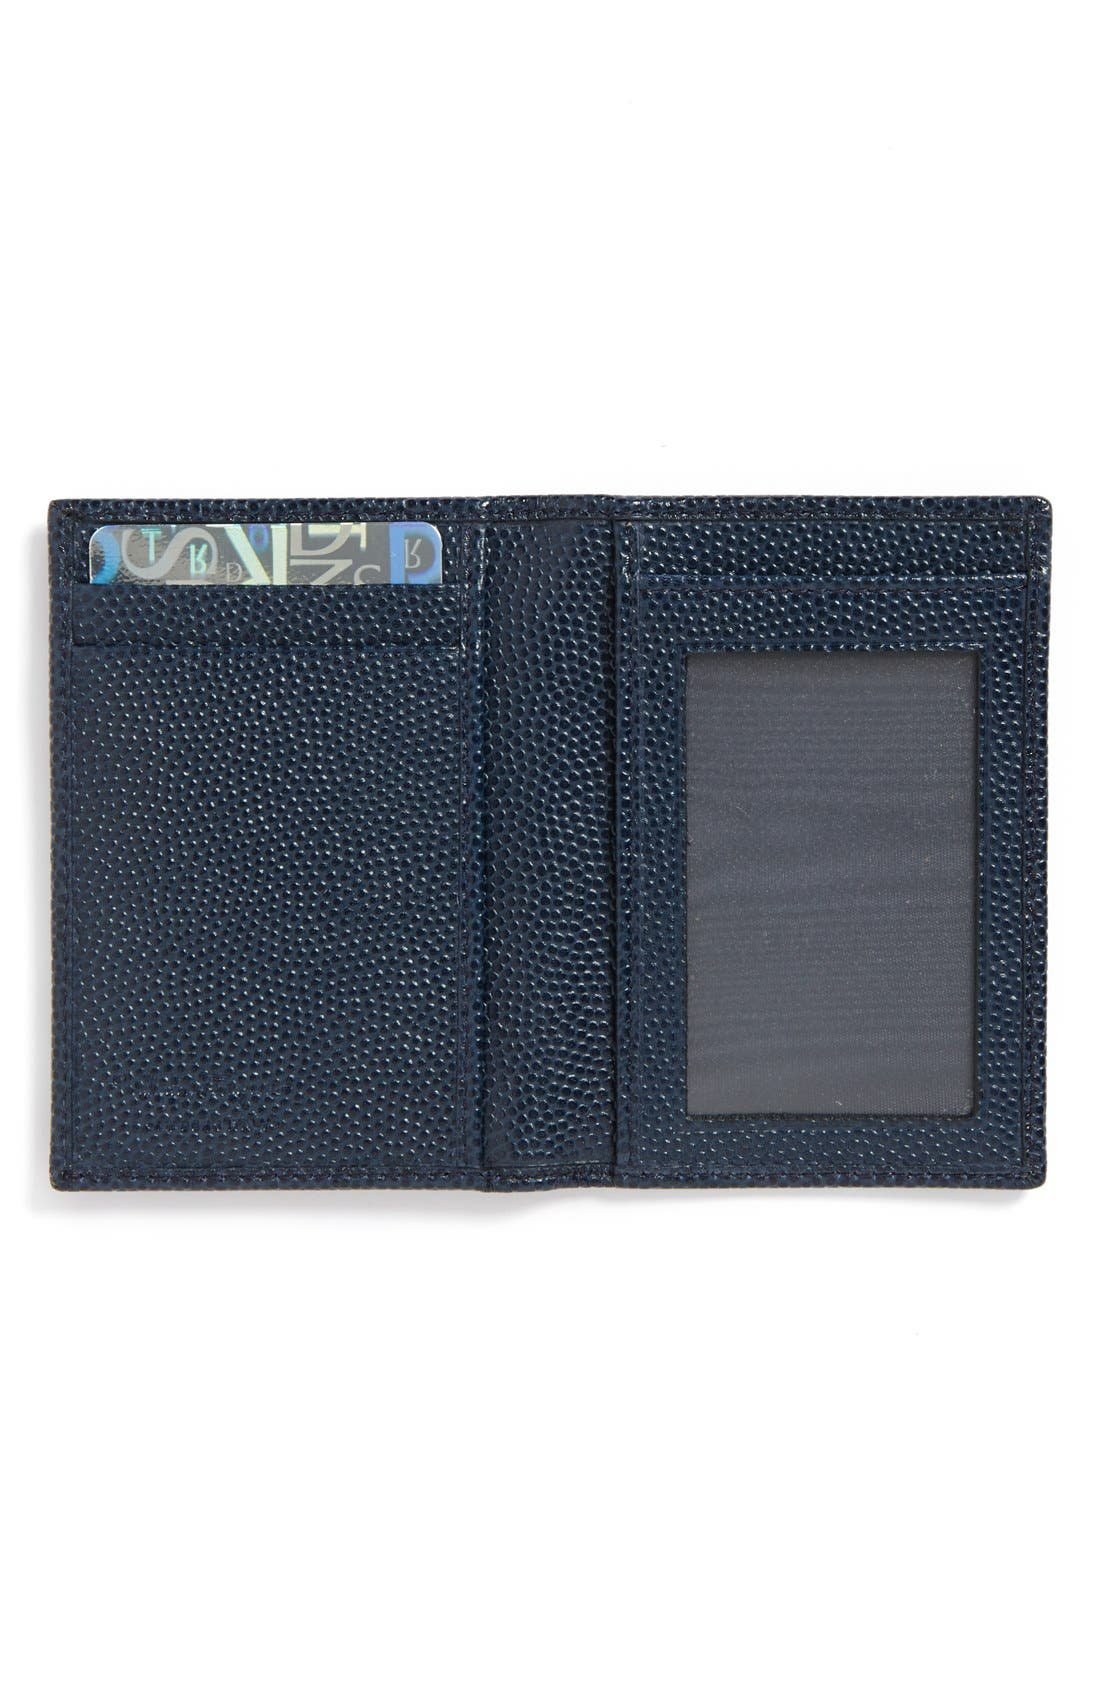 Alternate Image 2  - Salvatore Ferragamo 'Ten Forty One' Leather Card Case